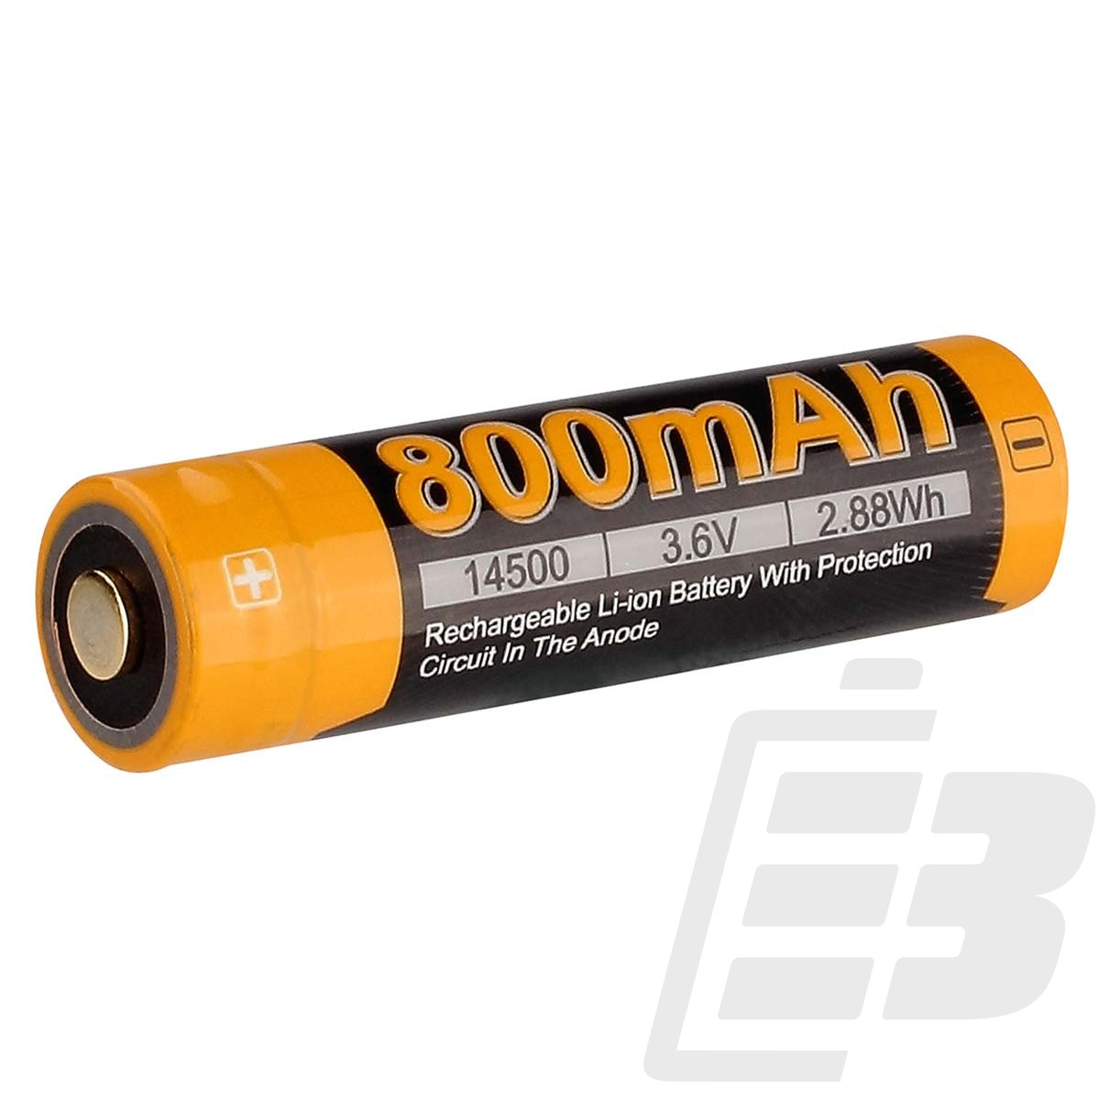 Fenix ARB-L14-800 14500 battery 800mAh 1